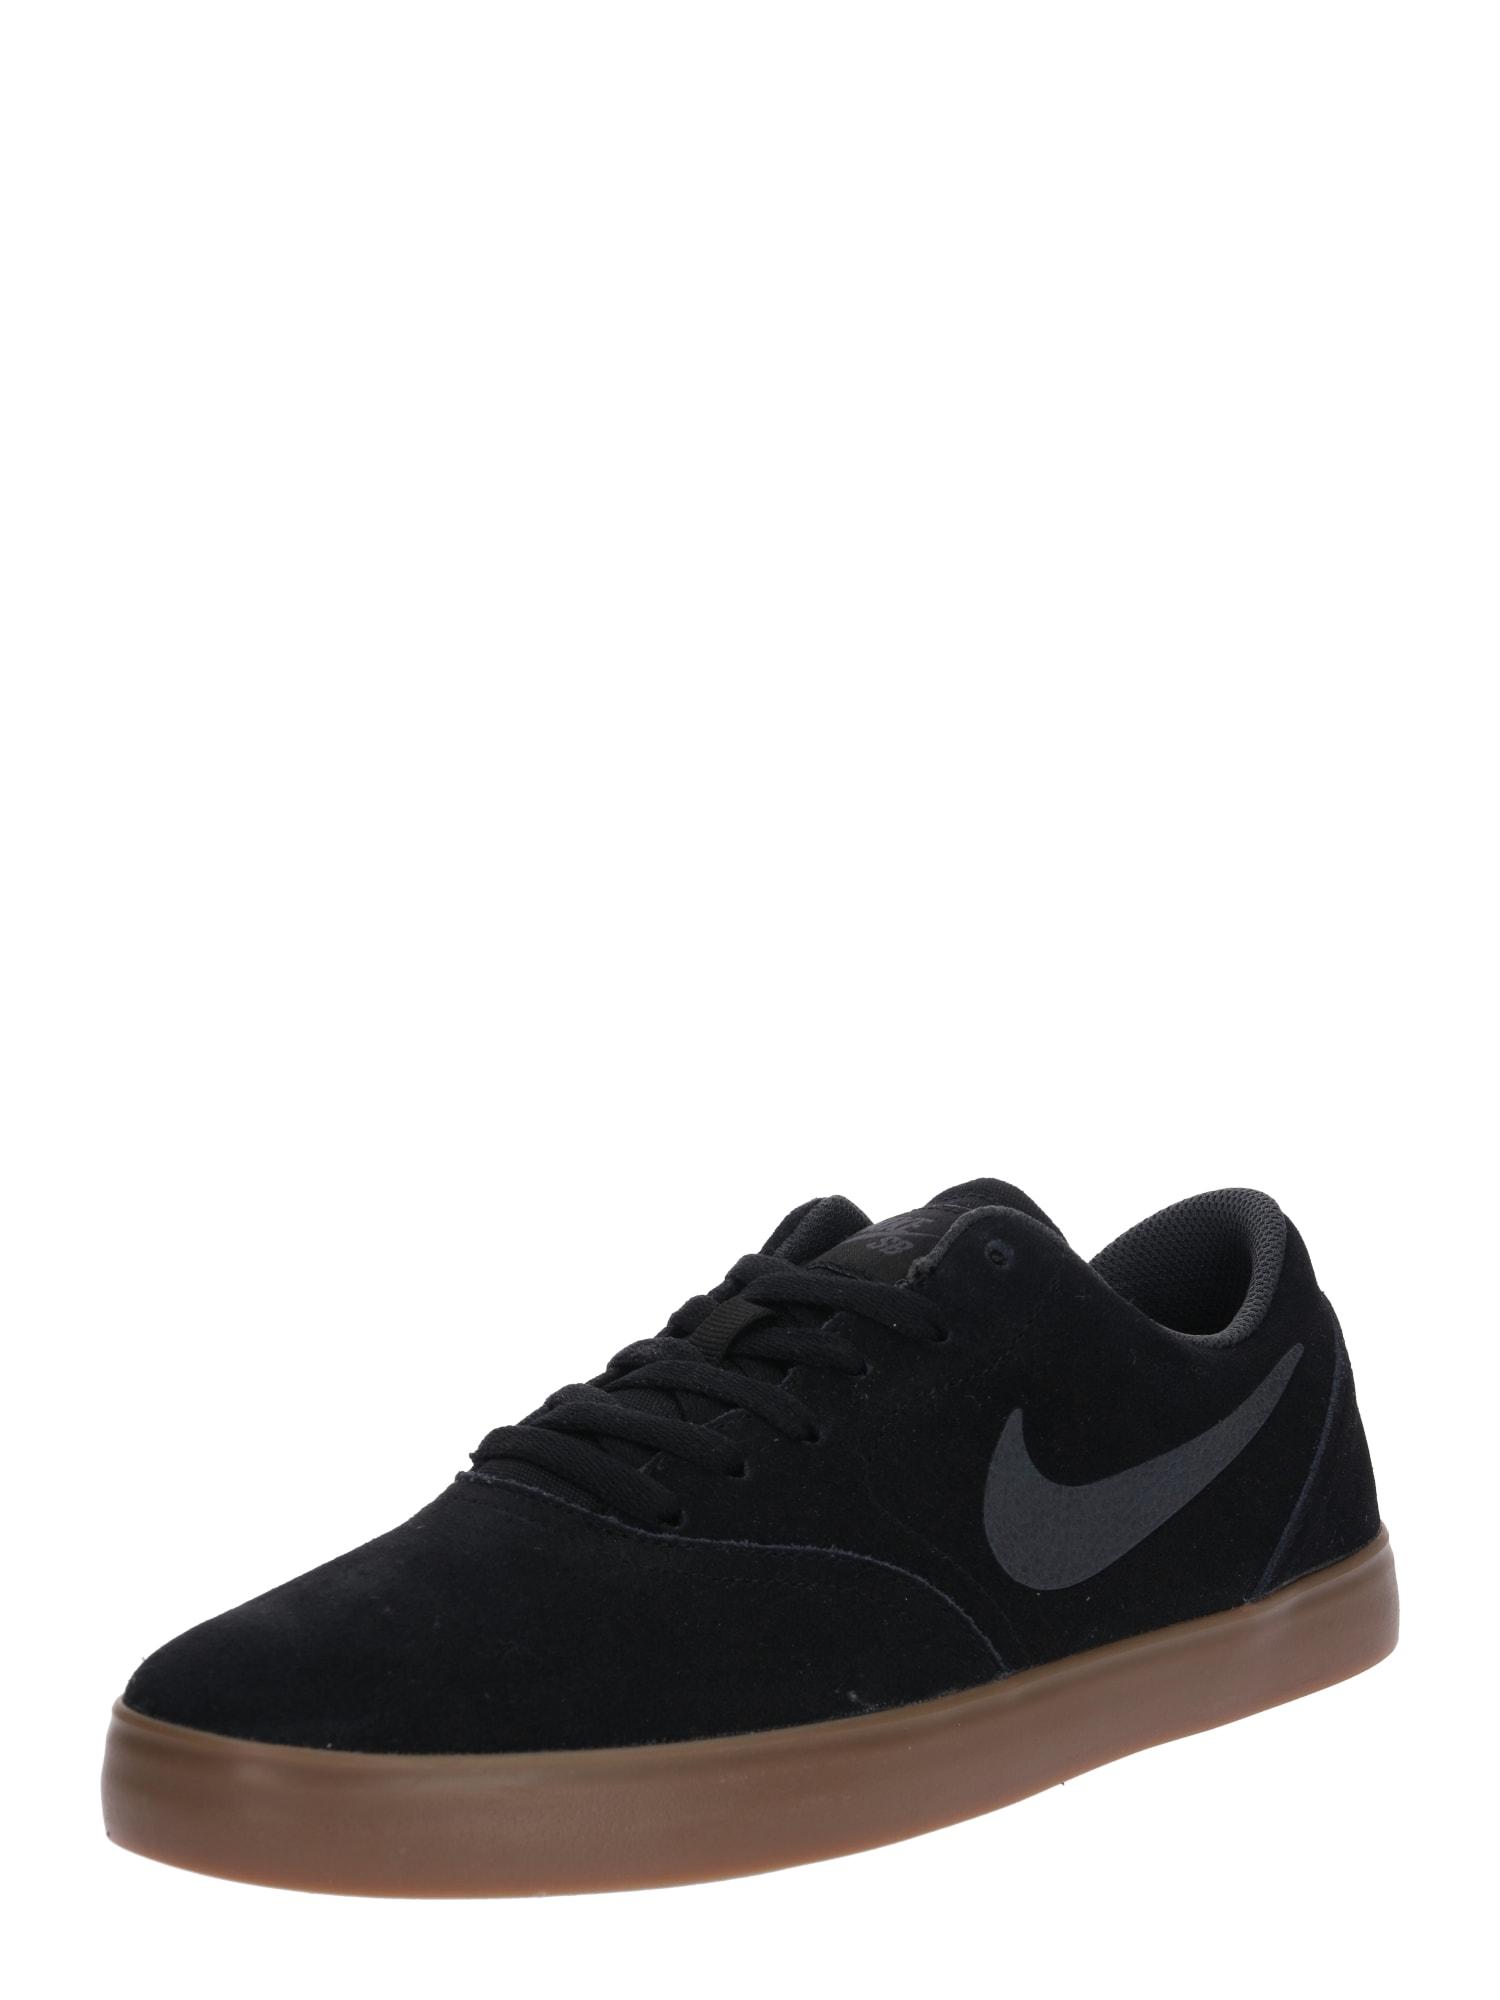 Tenisky Check černá Nike SB